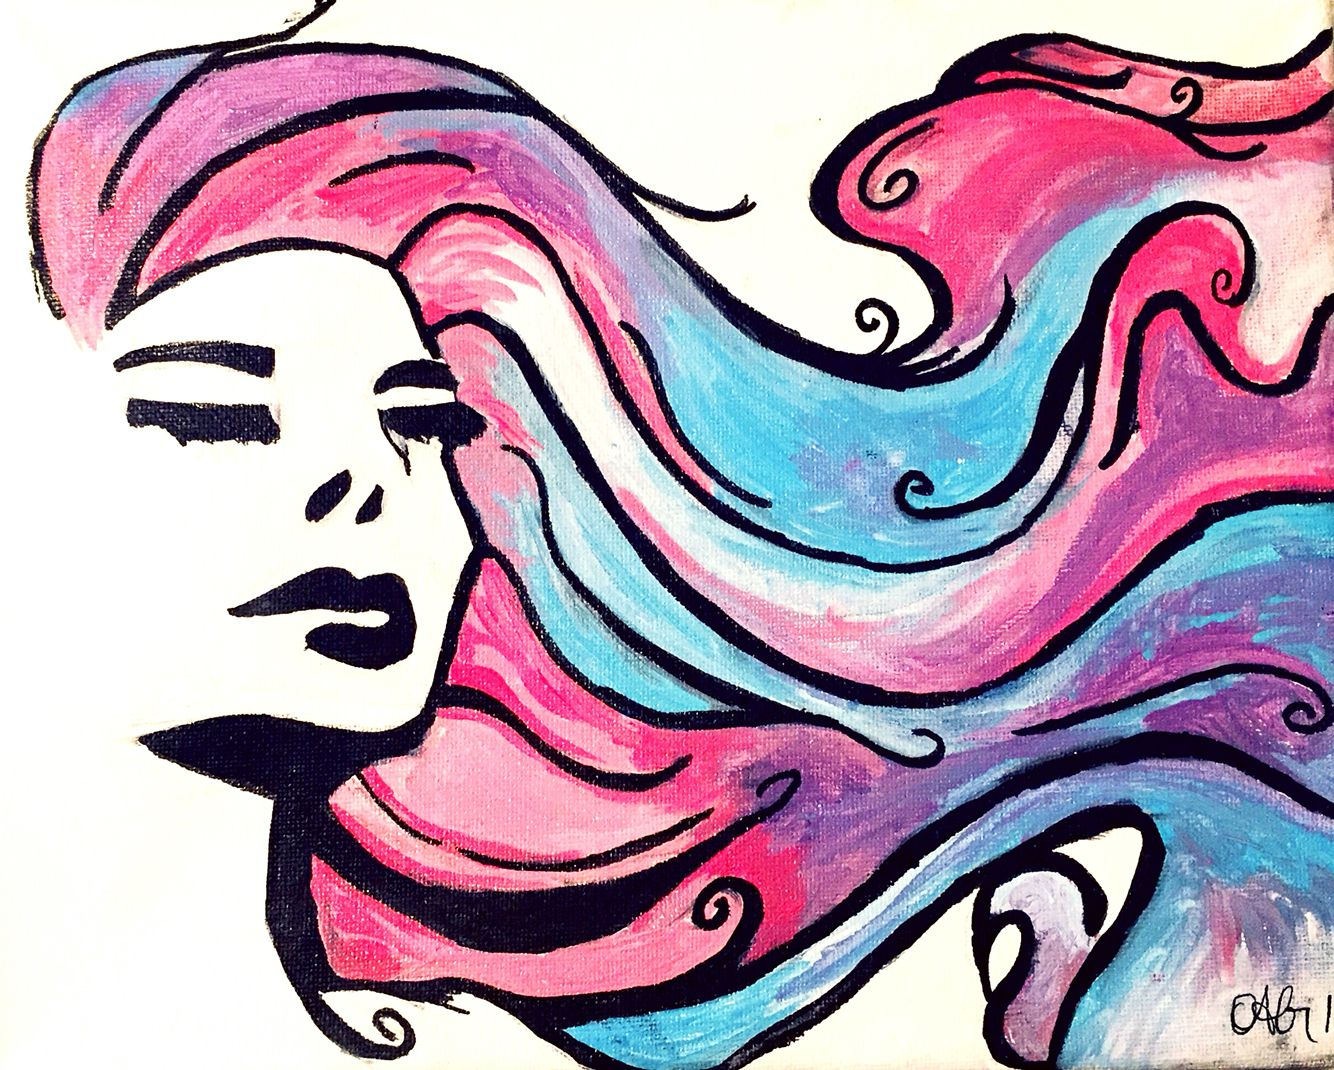 Zazrak Arbitraz Duvody Marker Drawing Ideas Richmondfuture Org